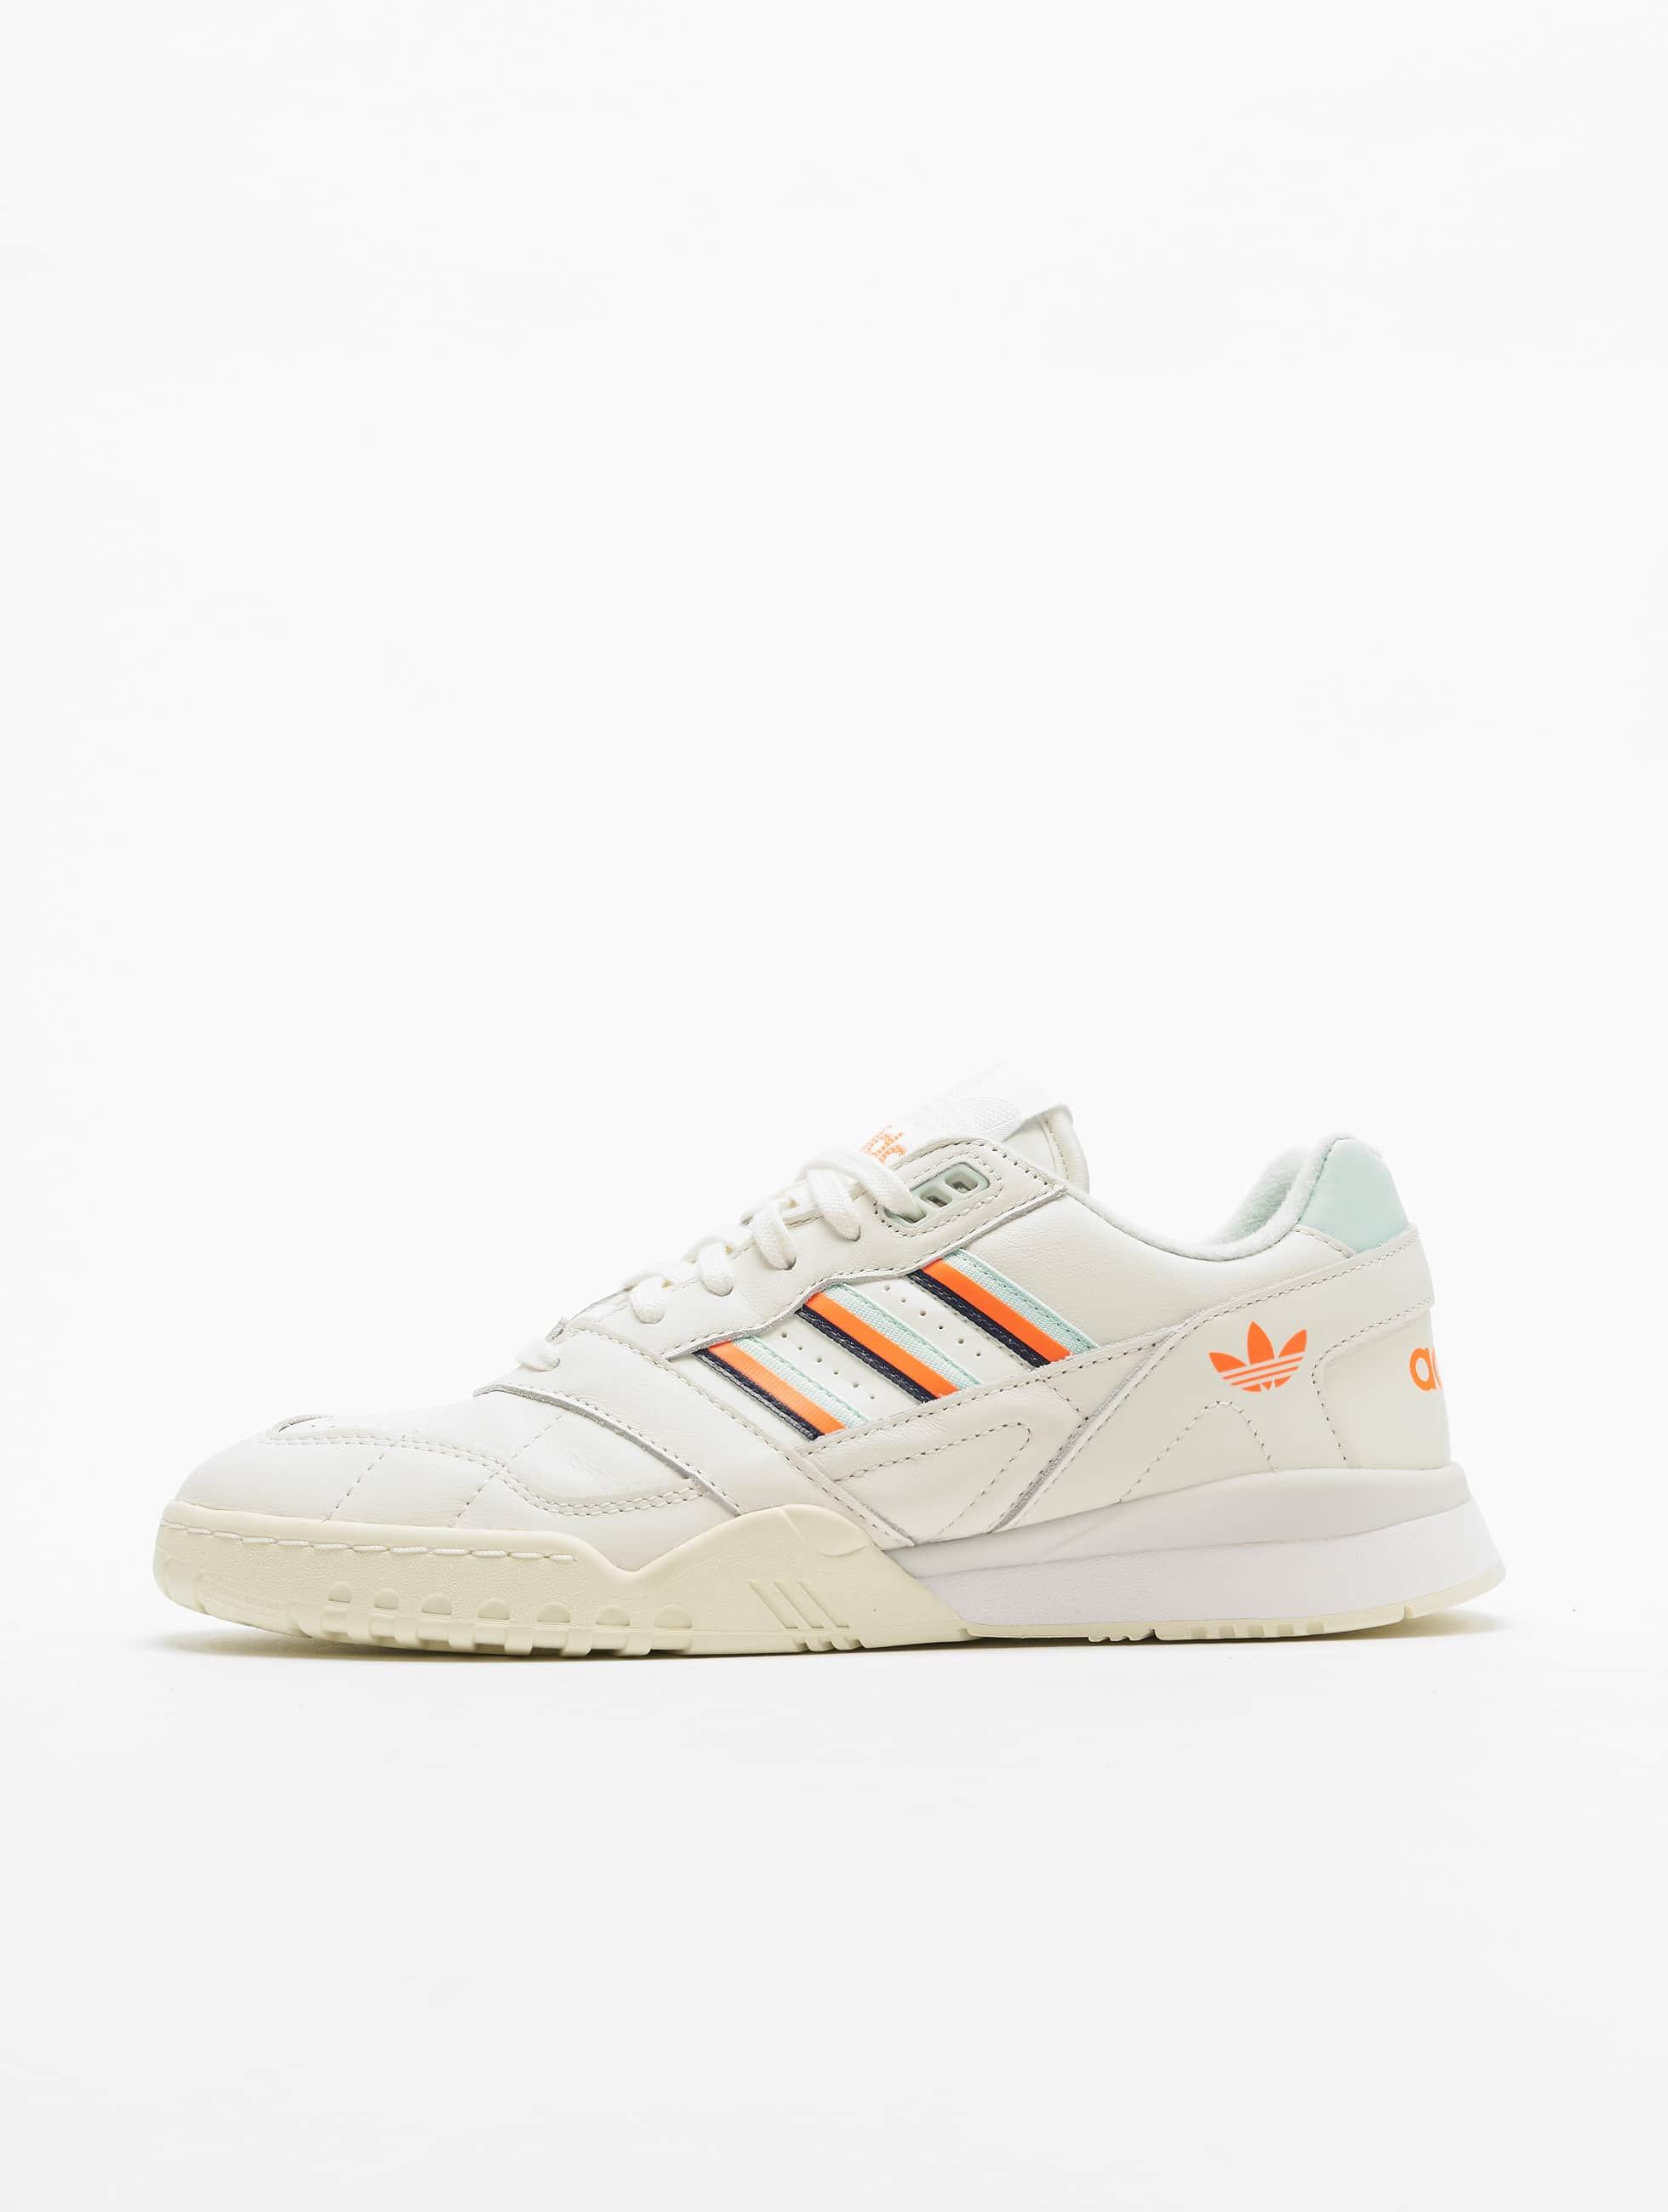 Whiteice Mintsolar Orange rTrainer Cloud A Sneakers Originals Adidas Fc3JTlK1u